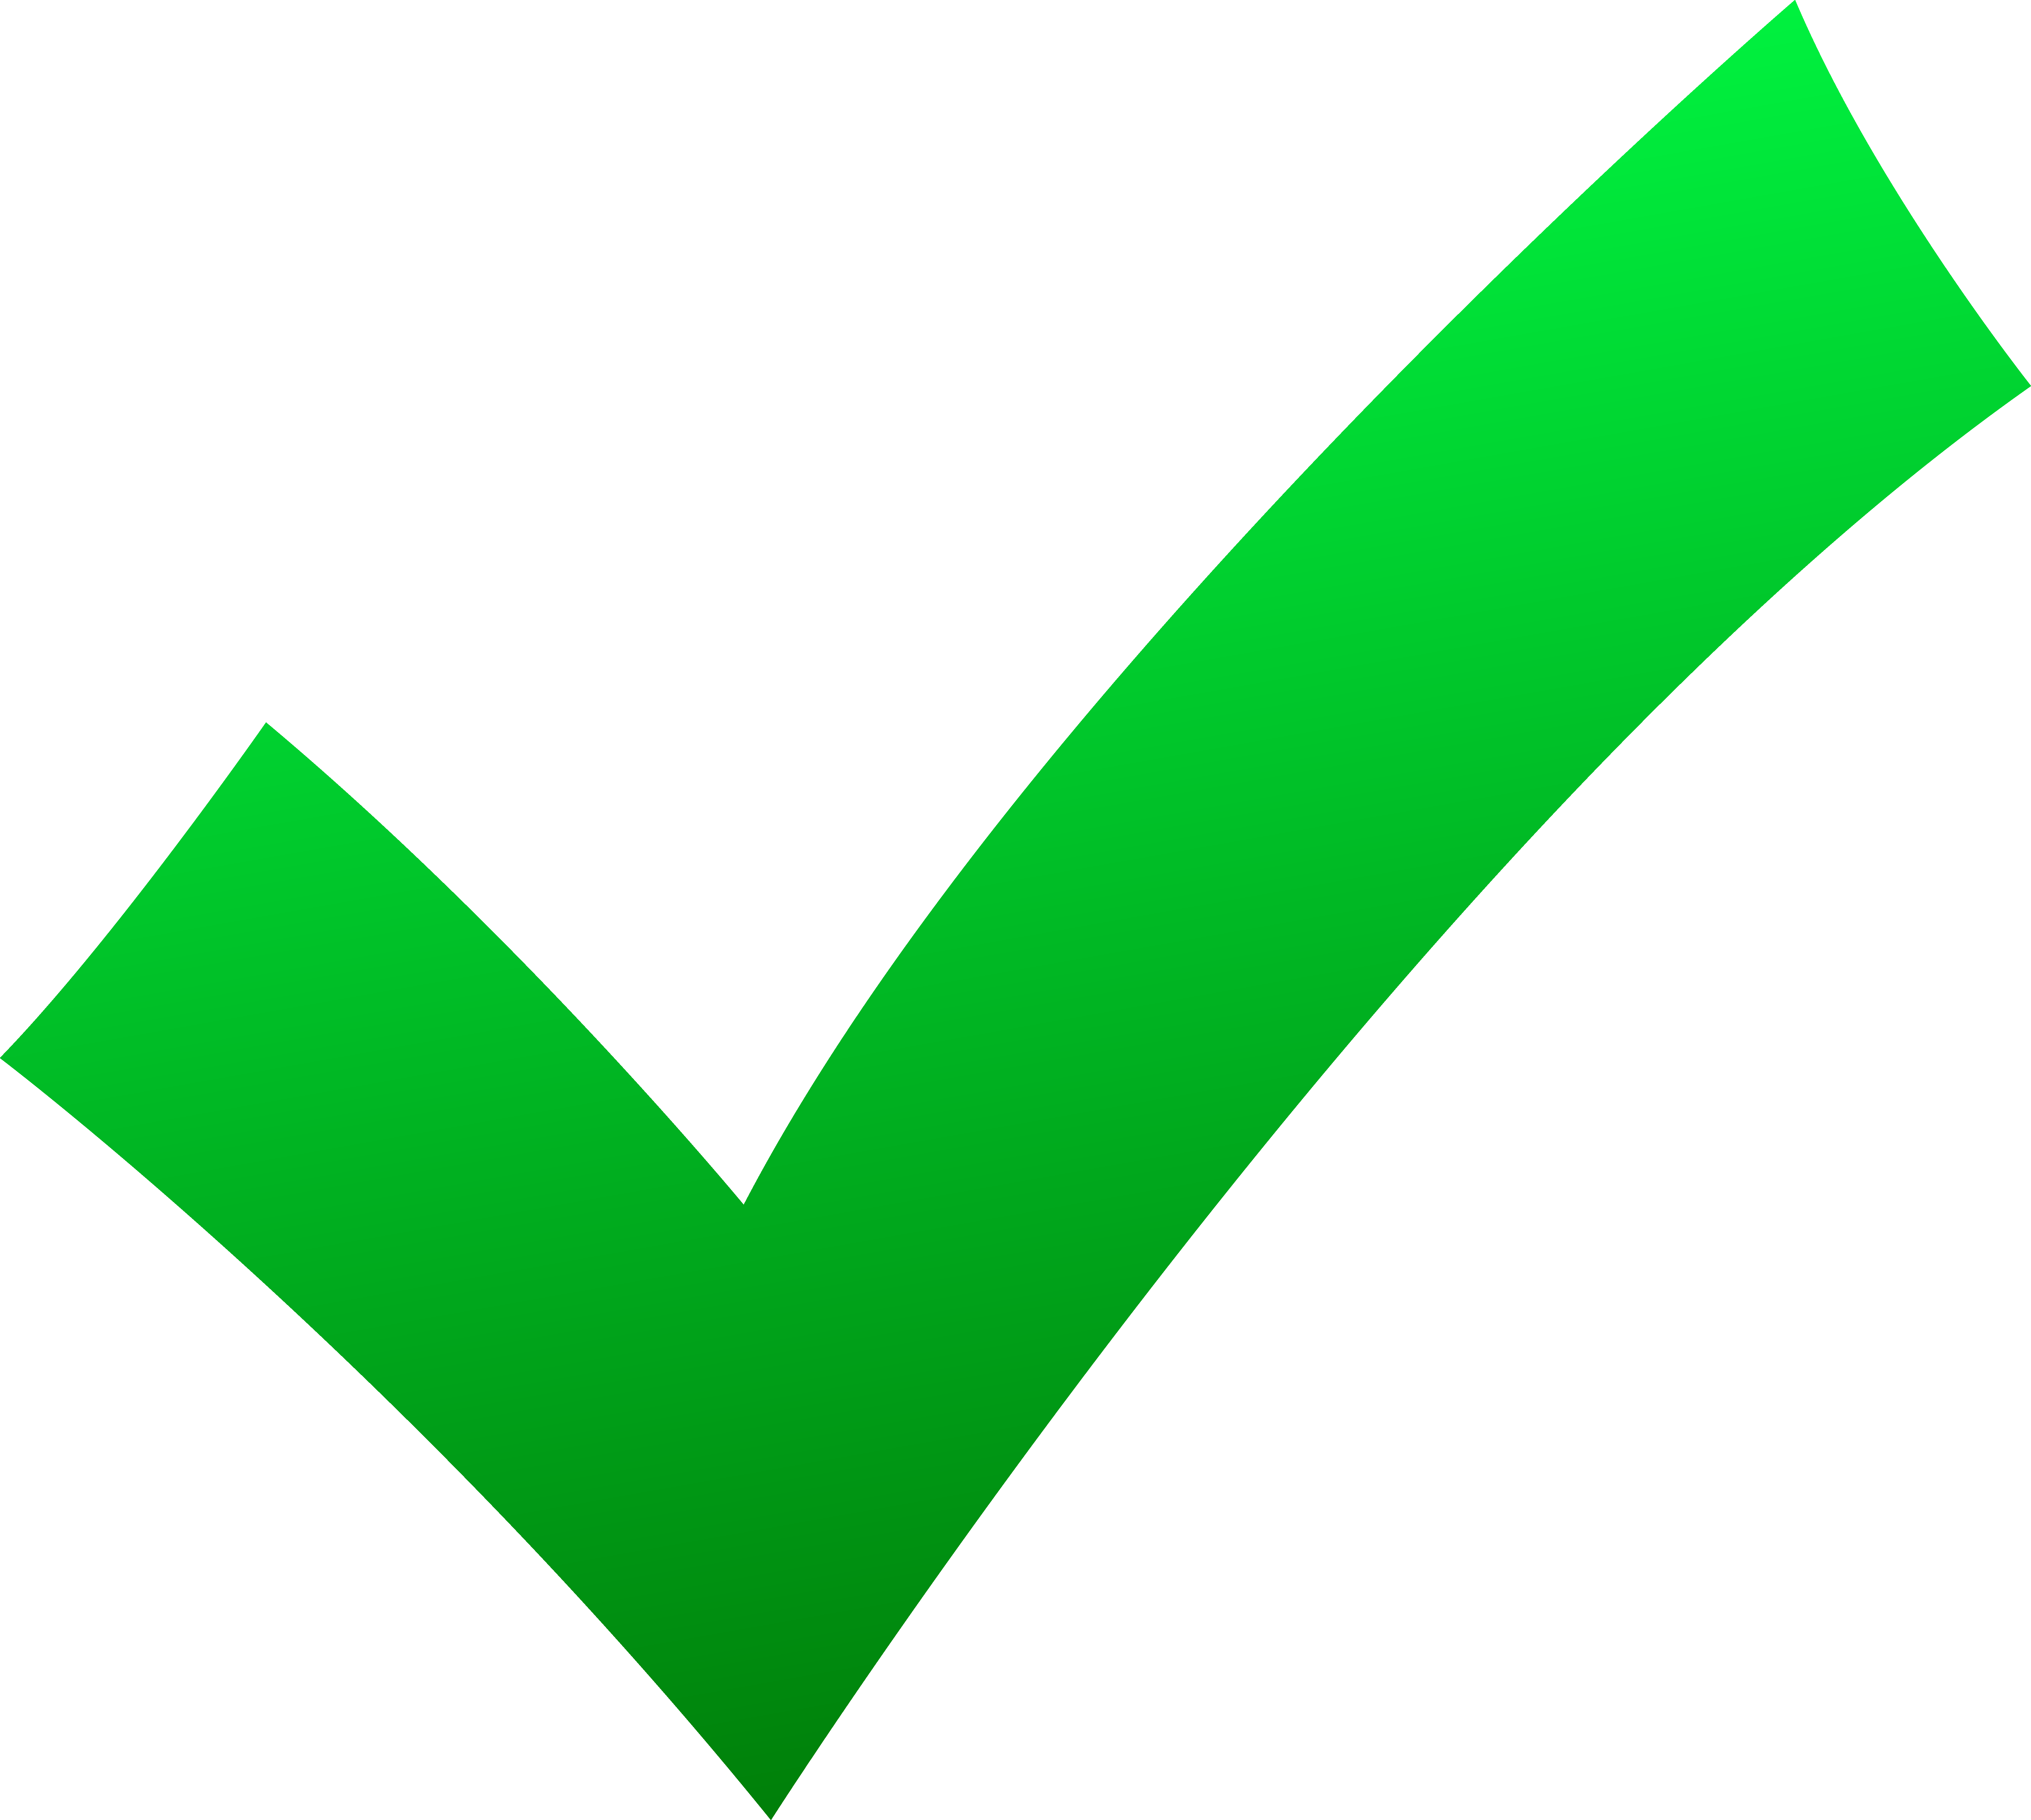 ... Free Clipart Check Mark Symbol ...-... Free clipart check mark symbol ...-16